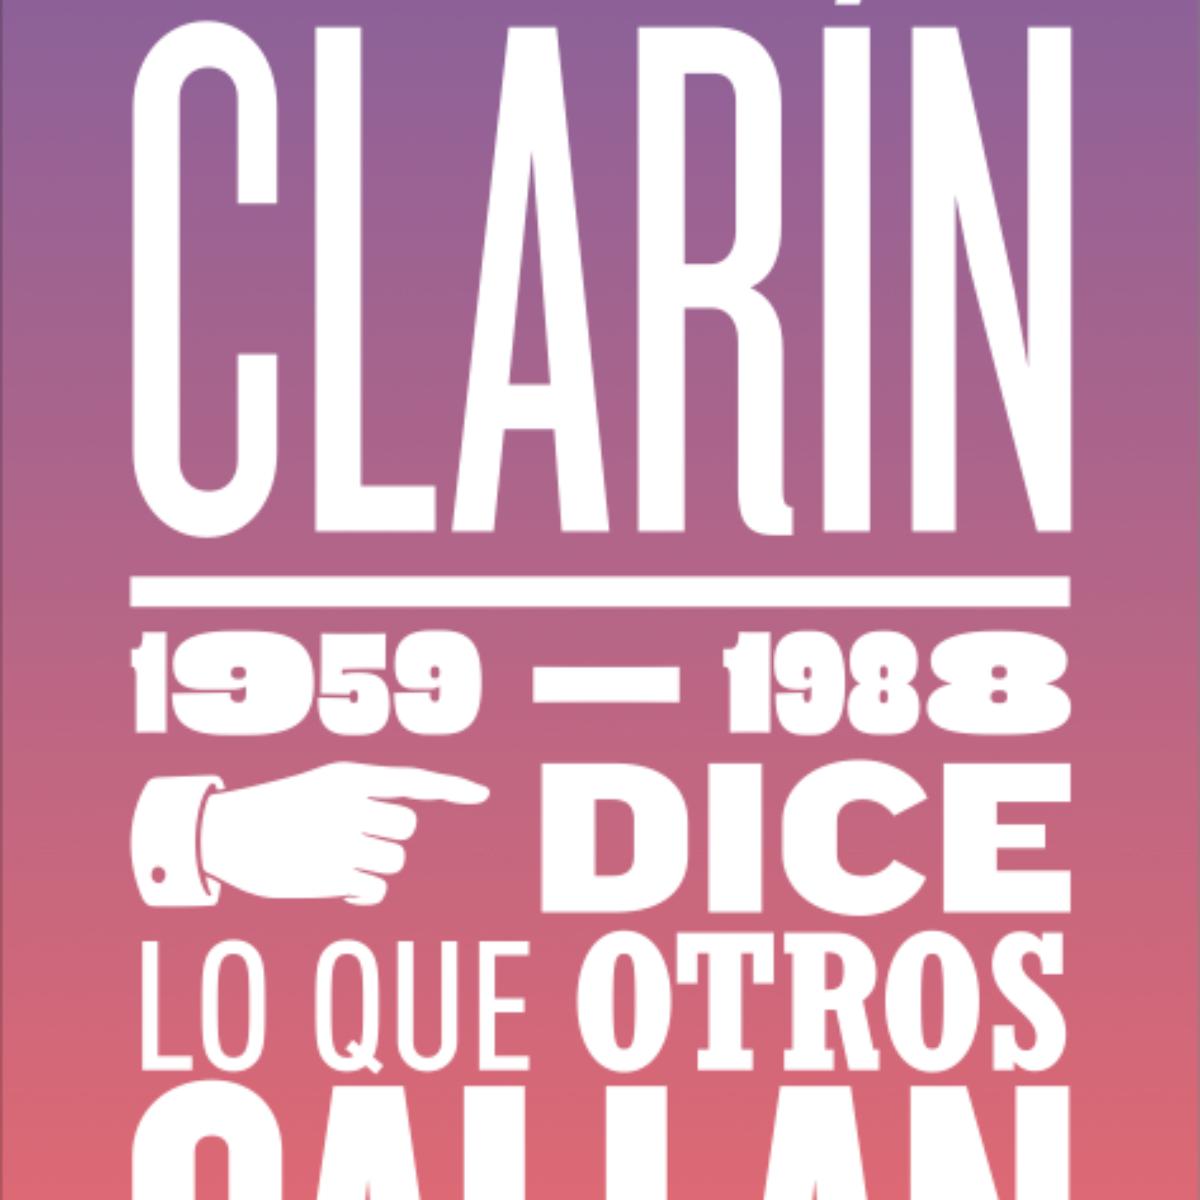 Radioperiódico Clarín